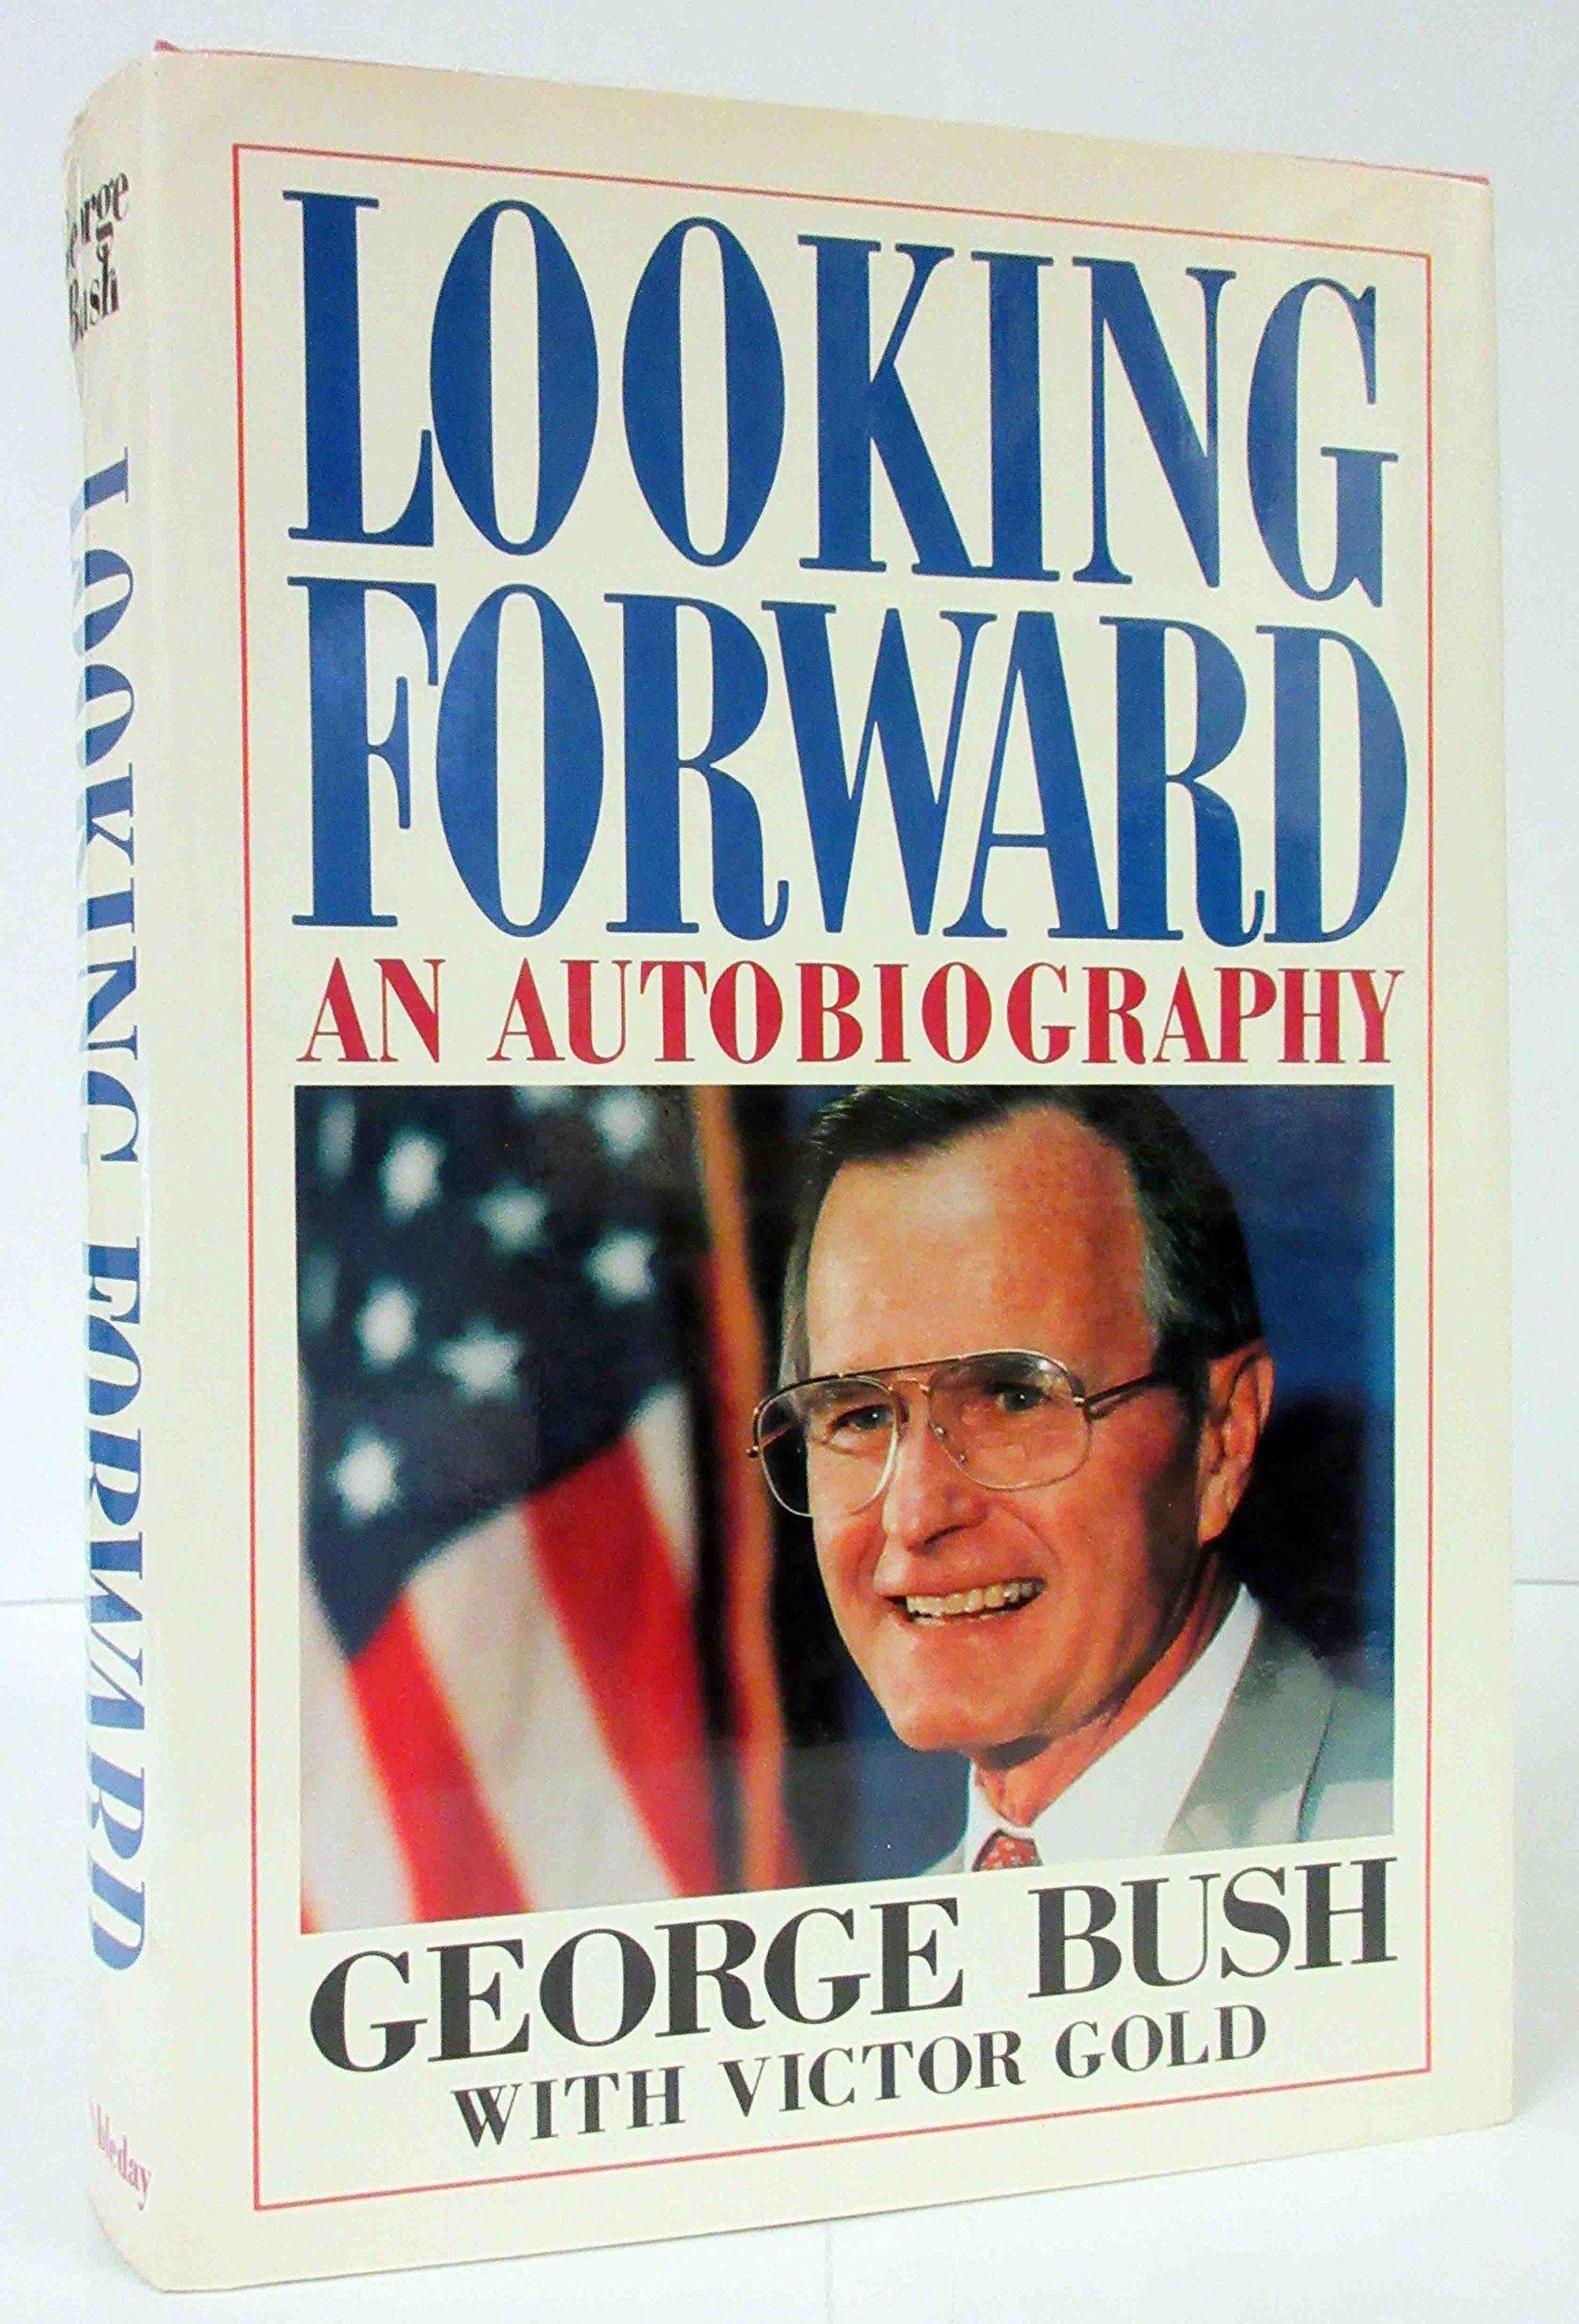 Looking Forward George Bush 9780385141819 Amazon Com Books